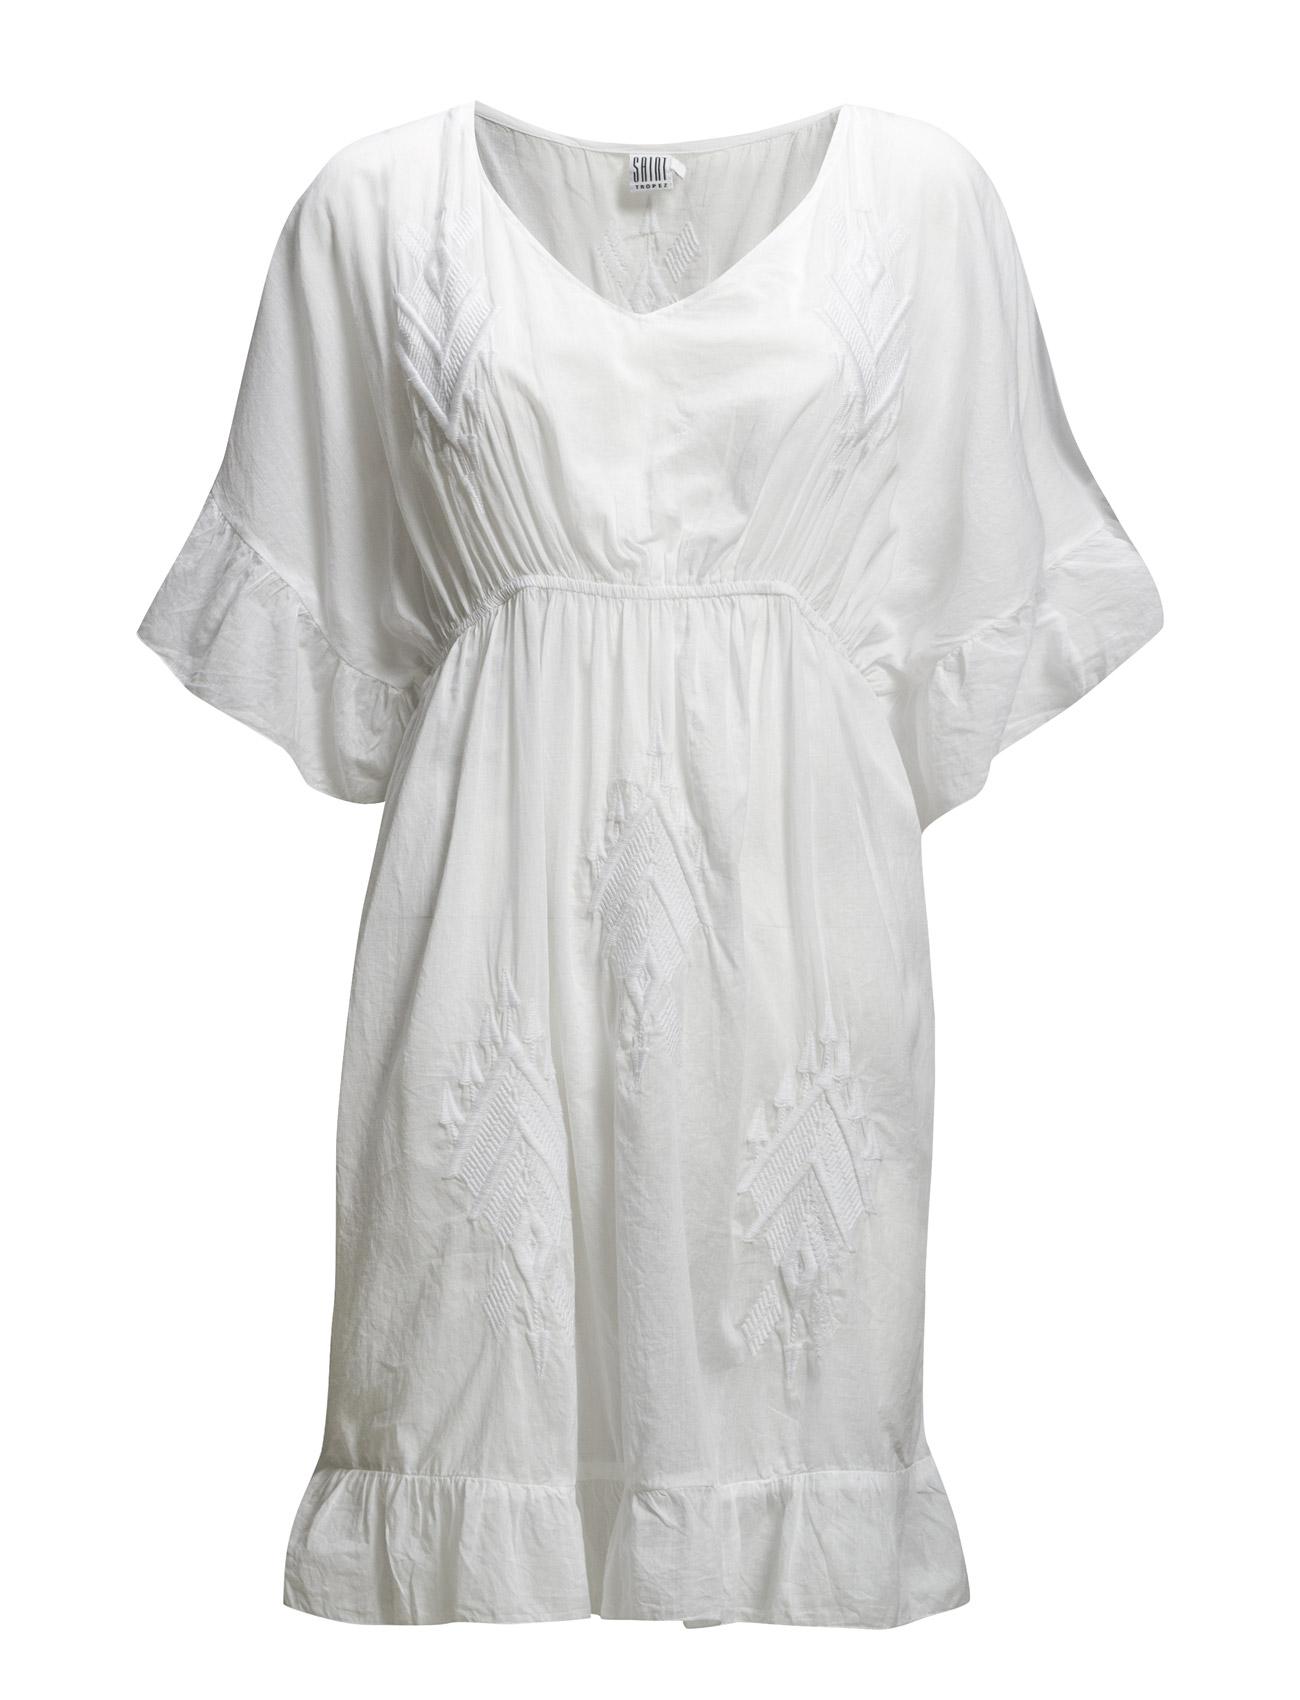 Saint Tropez EMBROIDERED DRESS - WHITE